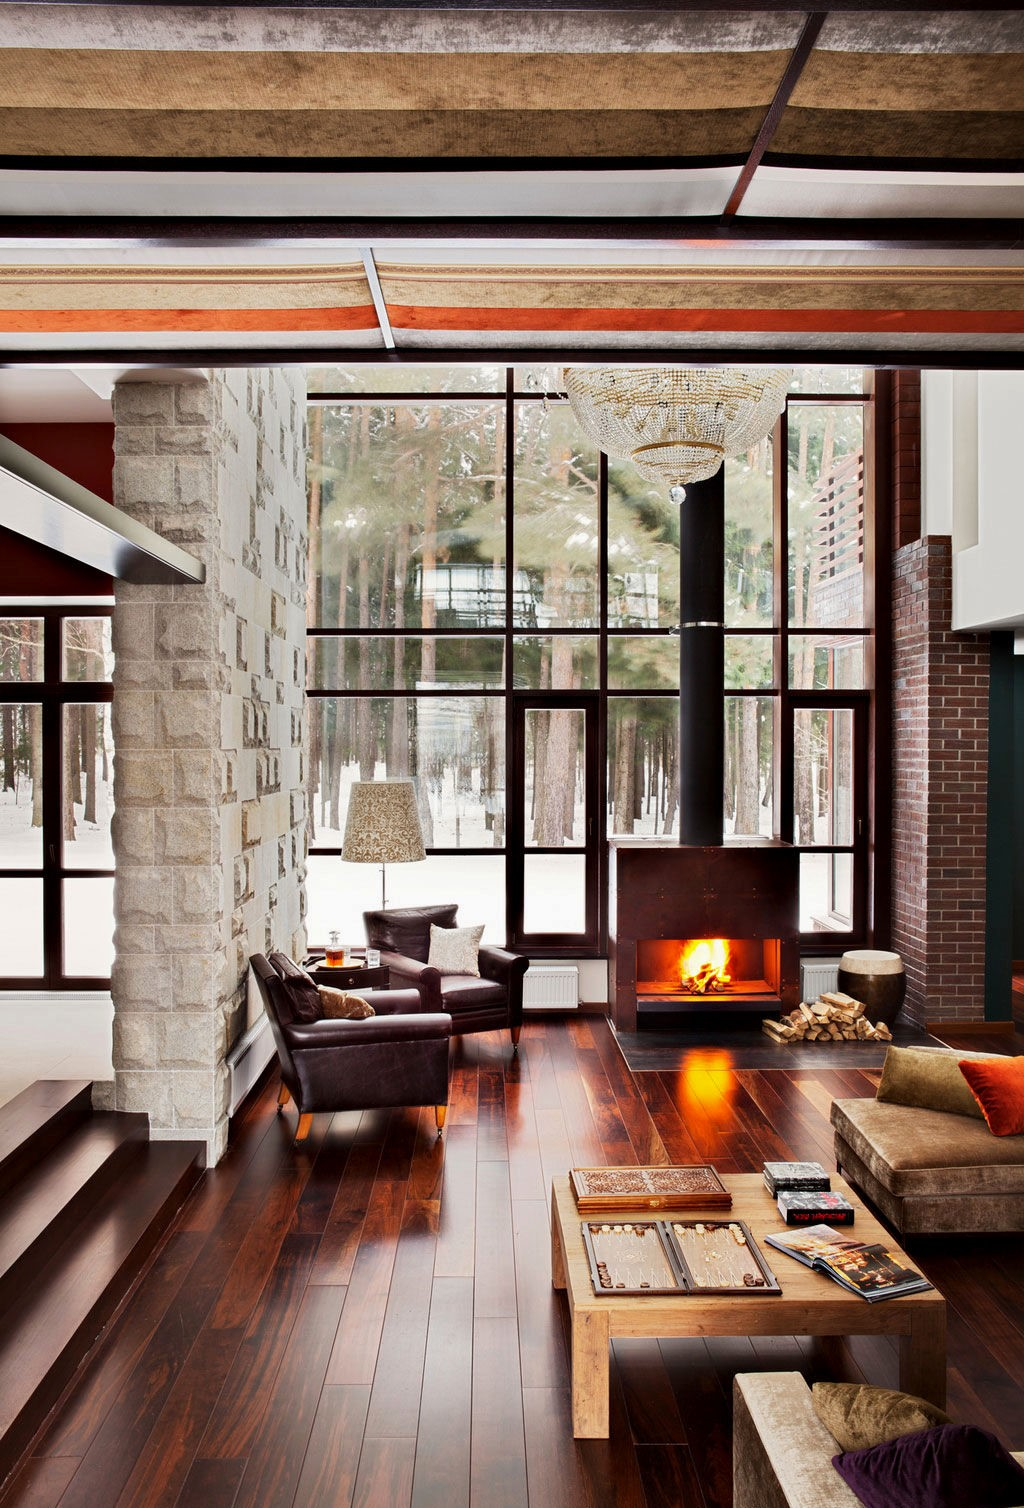 Best Christmas & Winter Interior Décor Ideas! 58